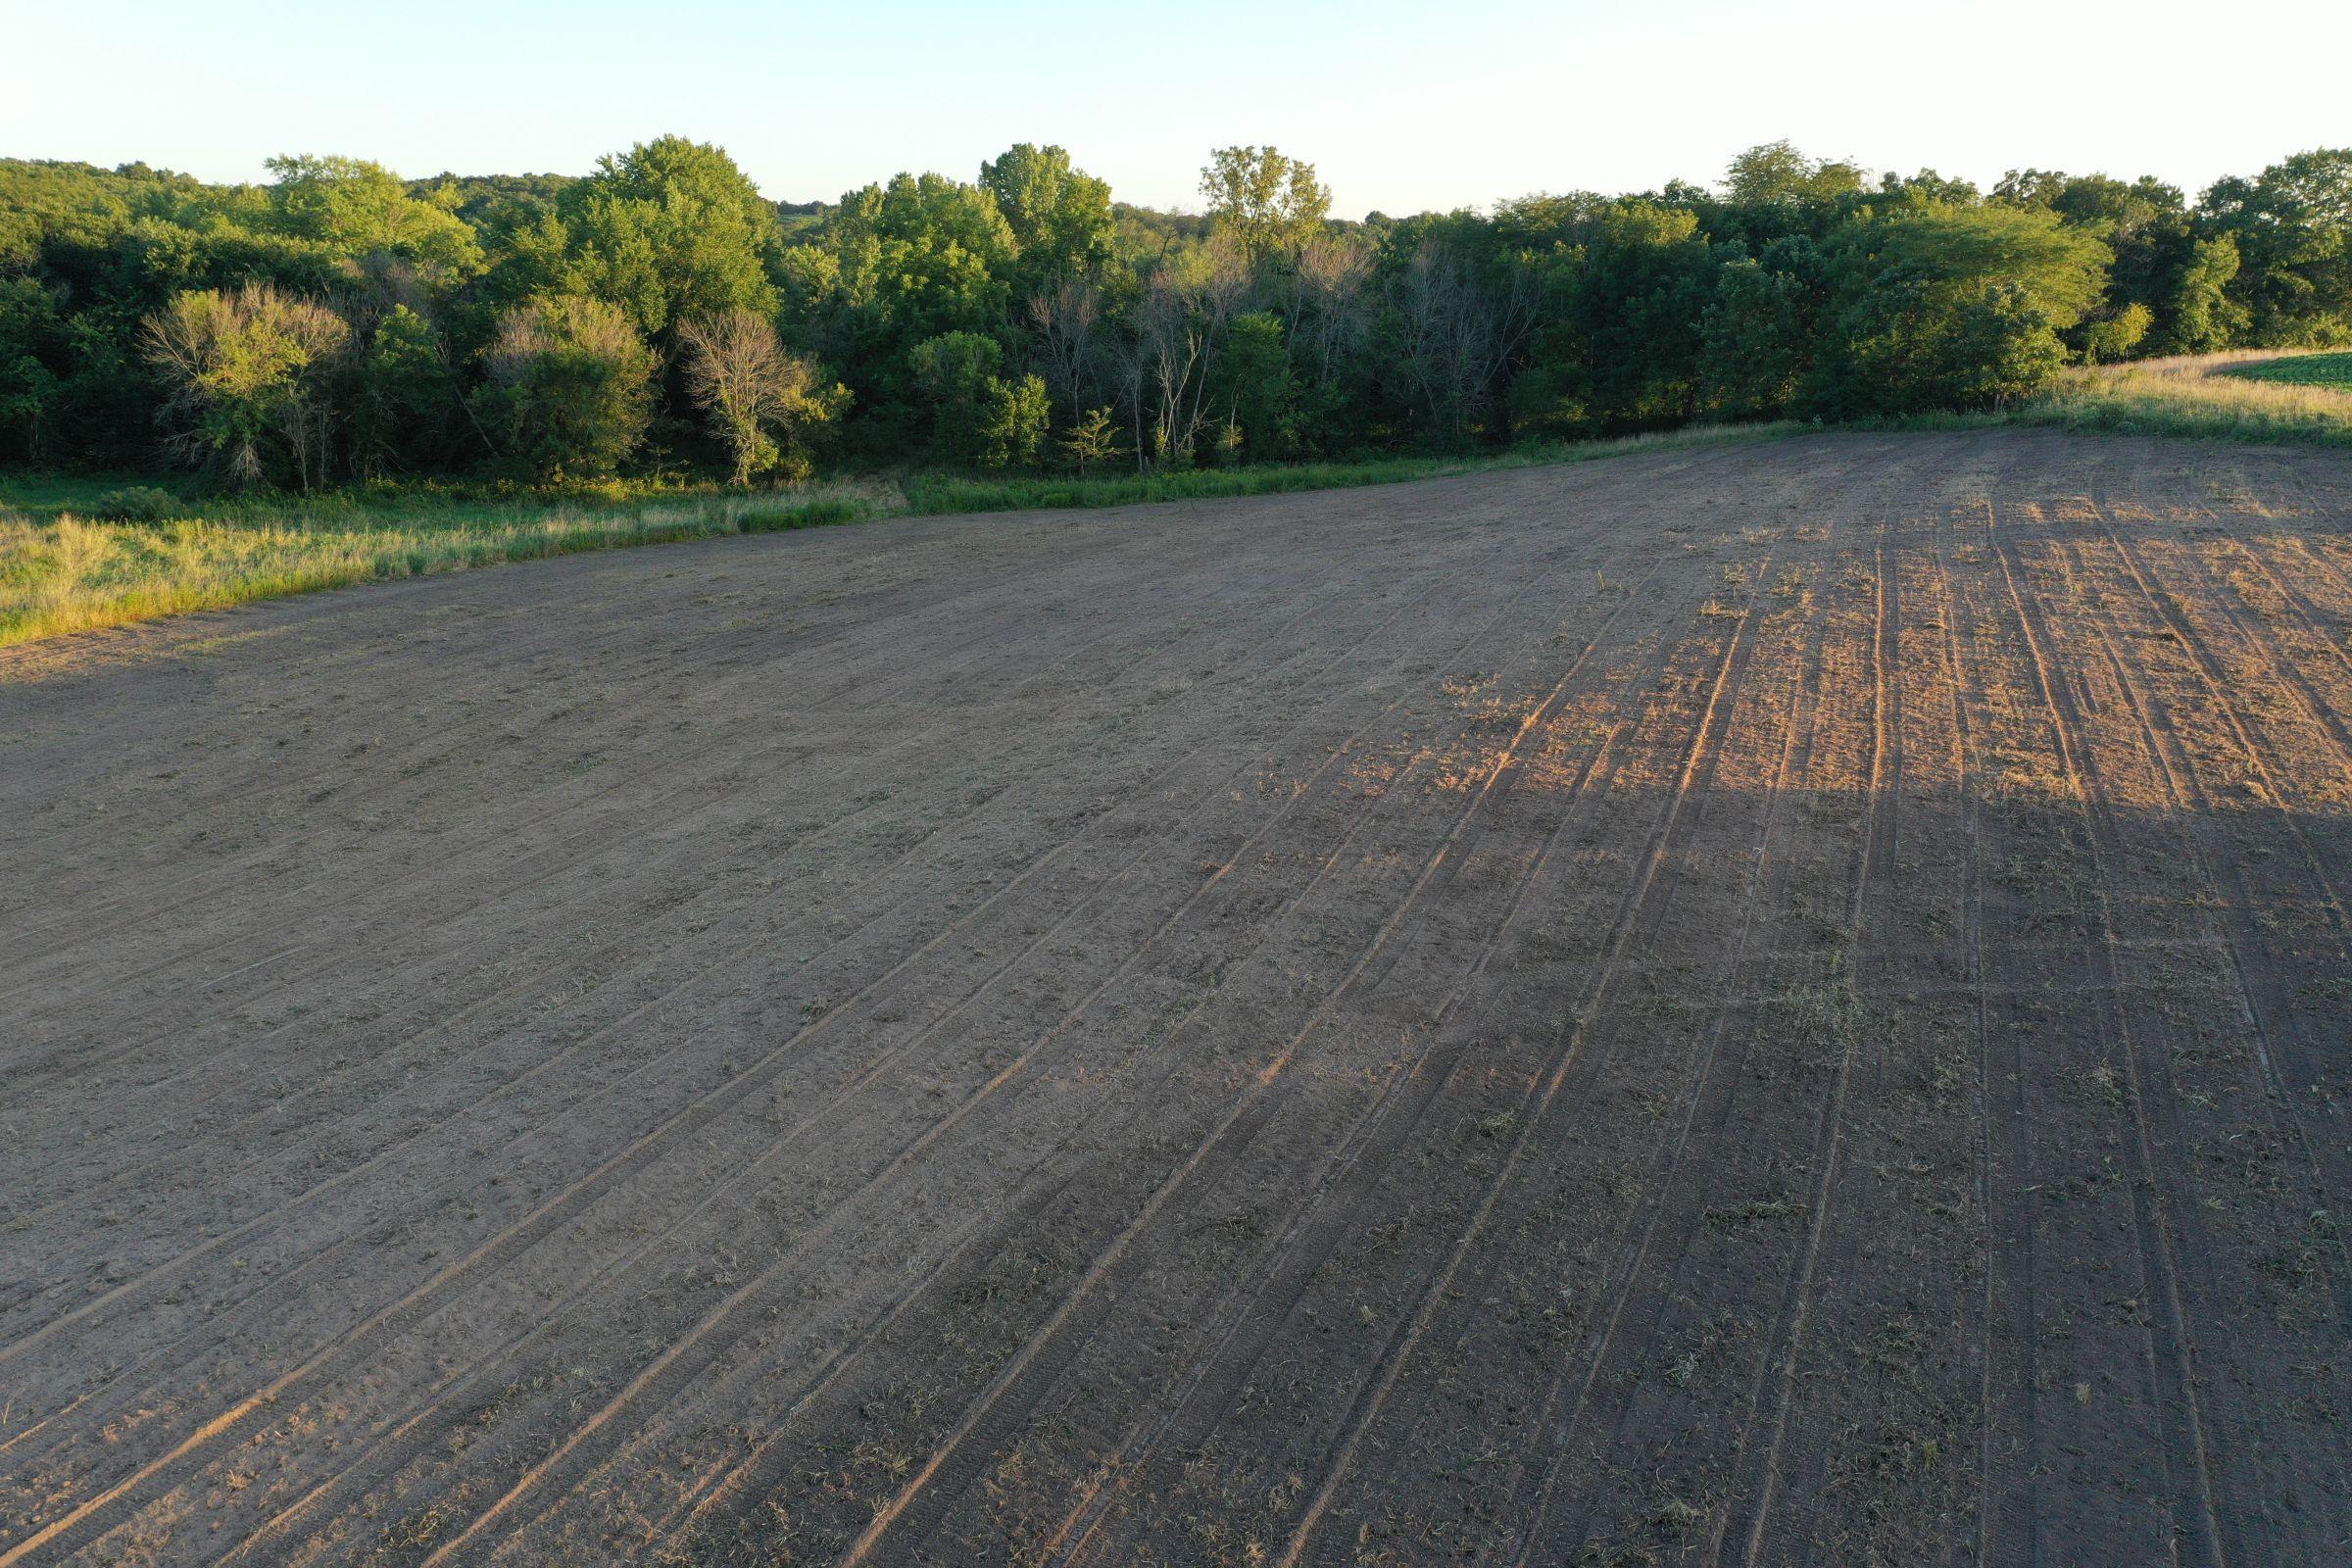 land-clarke-county-iowa-325-acres-listing-number-15416-6-2021-03-18-162759.JPG